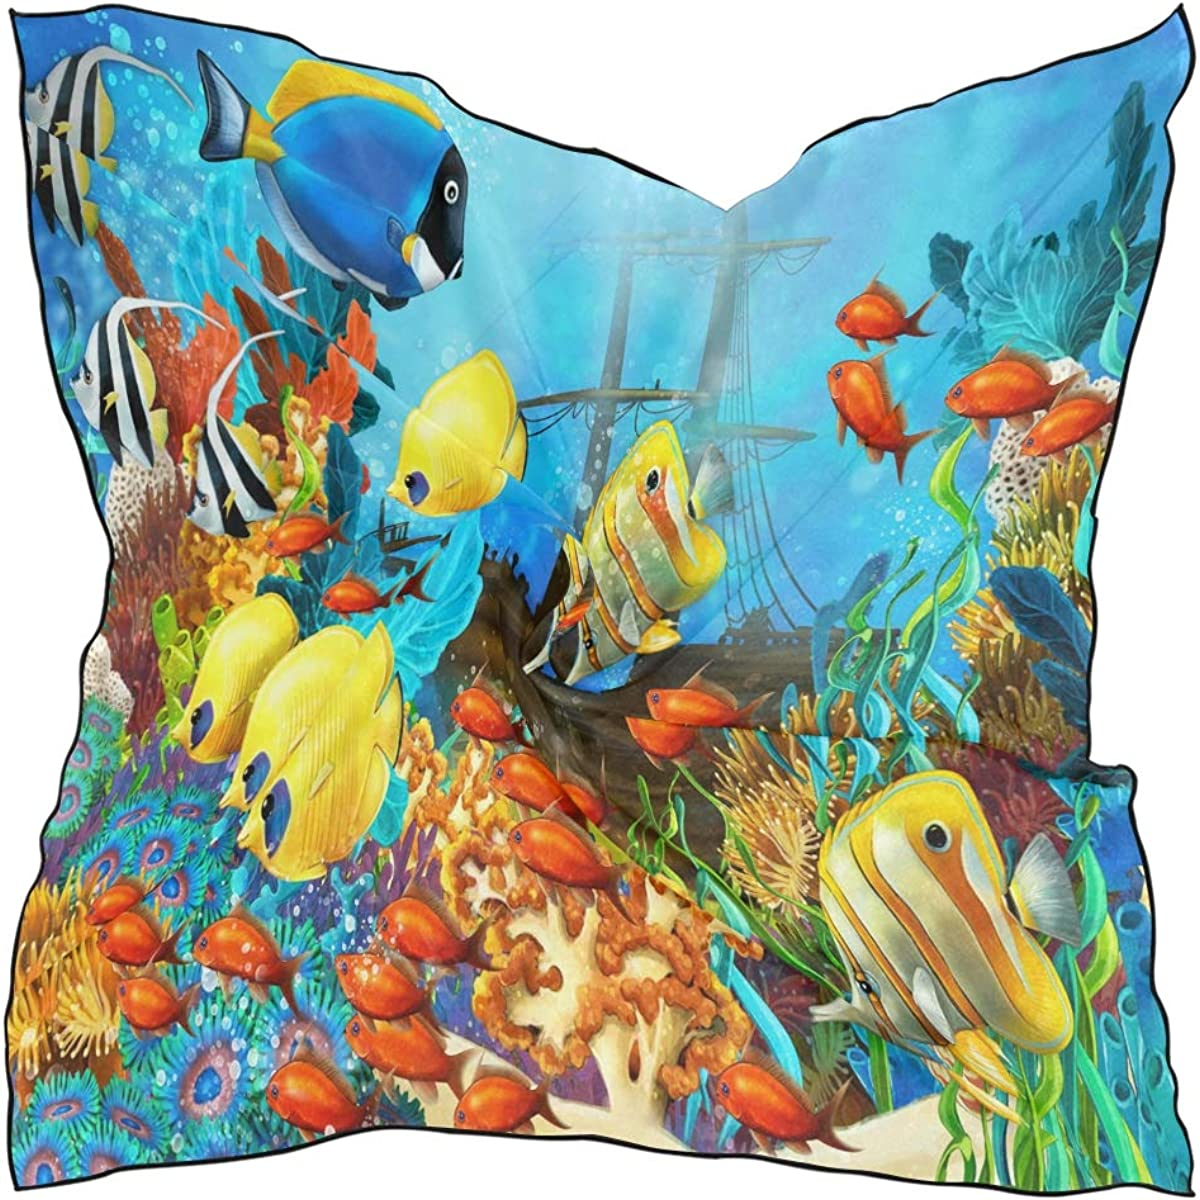 XLING Fashion Square Scarf Ocean Sea Tropical Fish Pattern Lightweight Sunscreen Scarves Muffler Hair Wrap Headscarf Neckerchief for Women Men